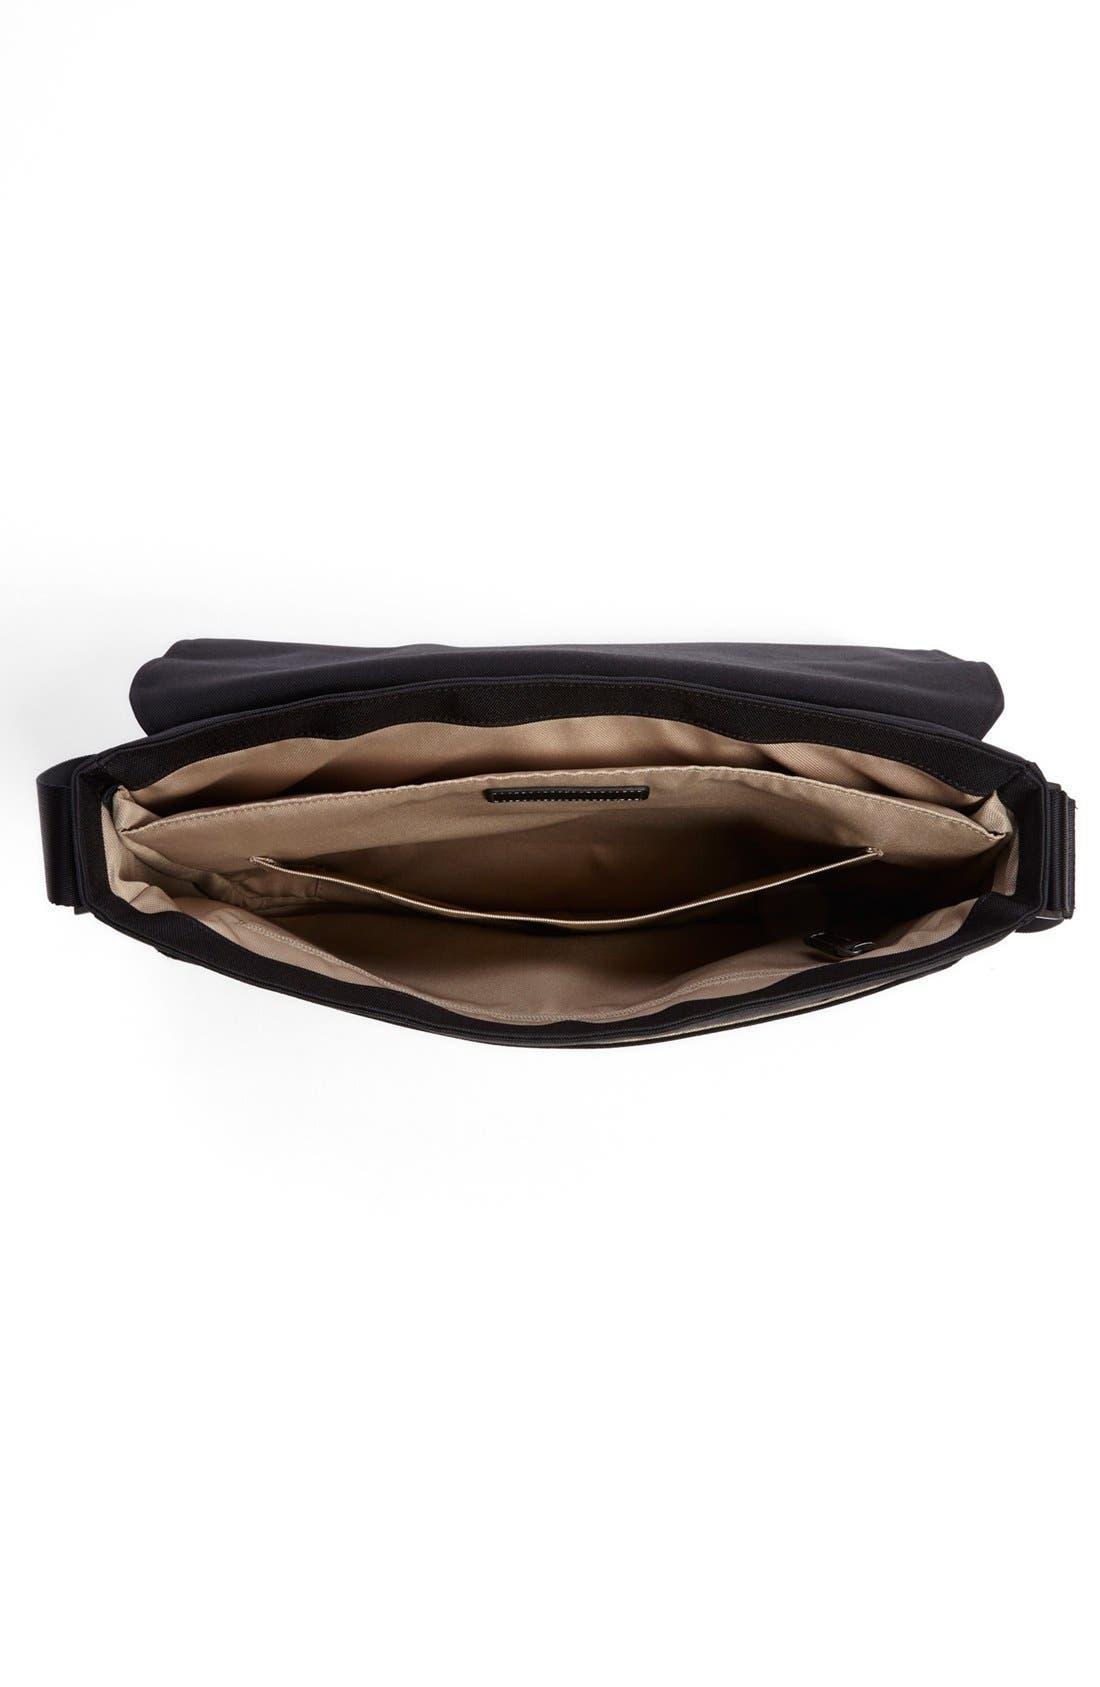 Tyler Slim Leather Laptop Briefcase,                             Alternate thumbnail 4, color,                             Black/ Khaki